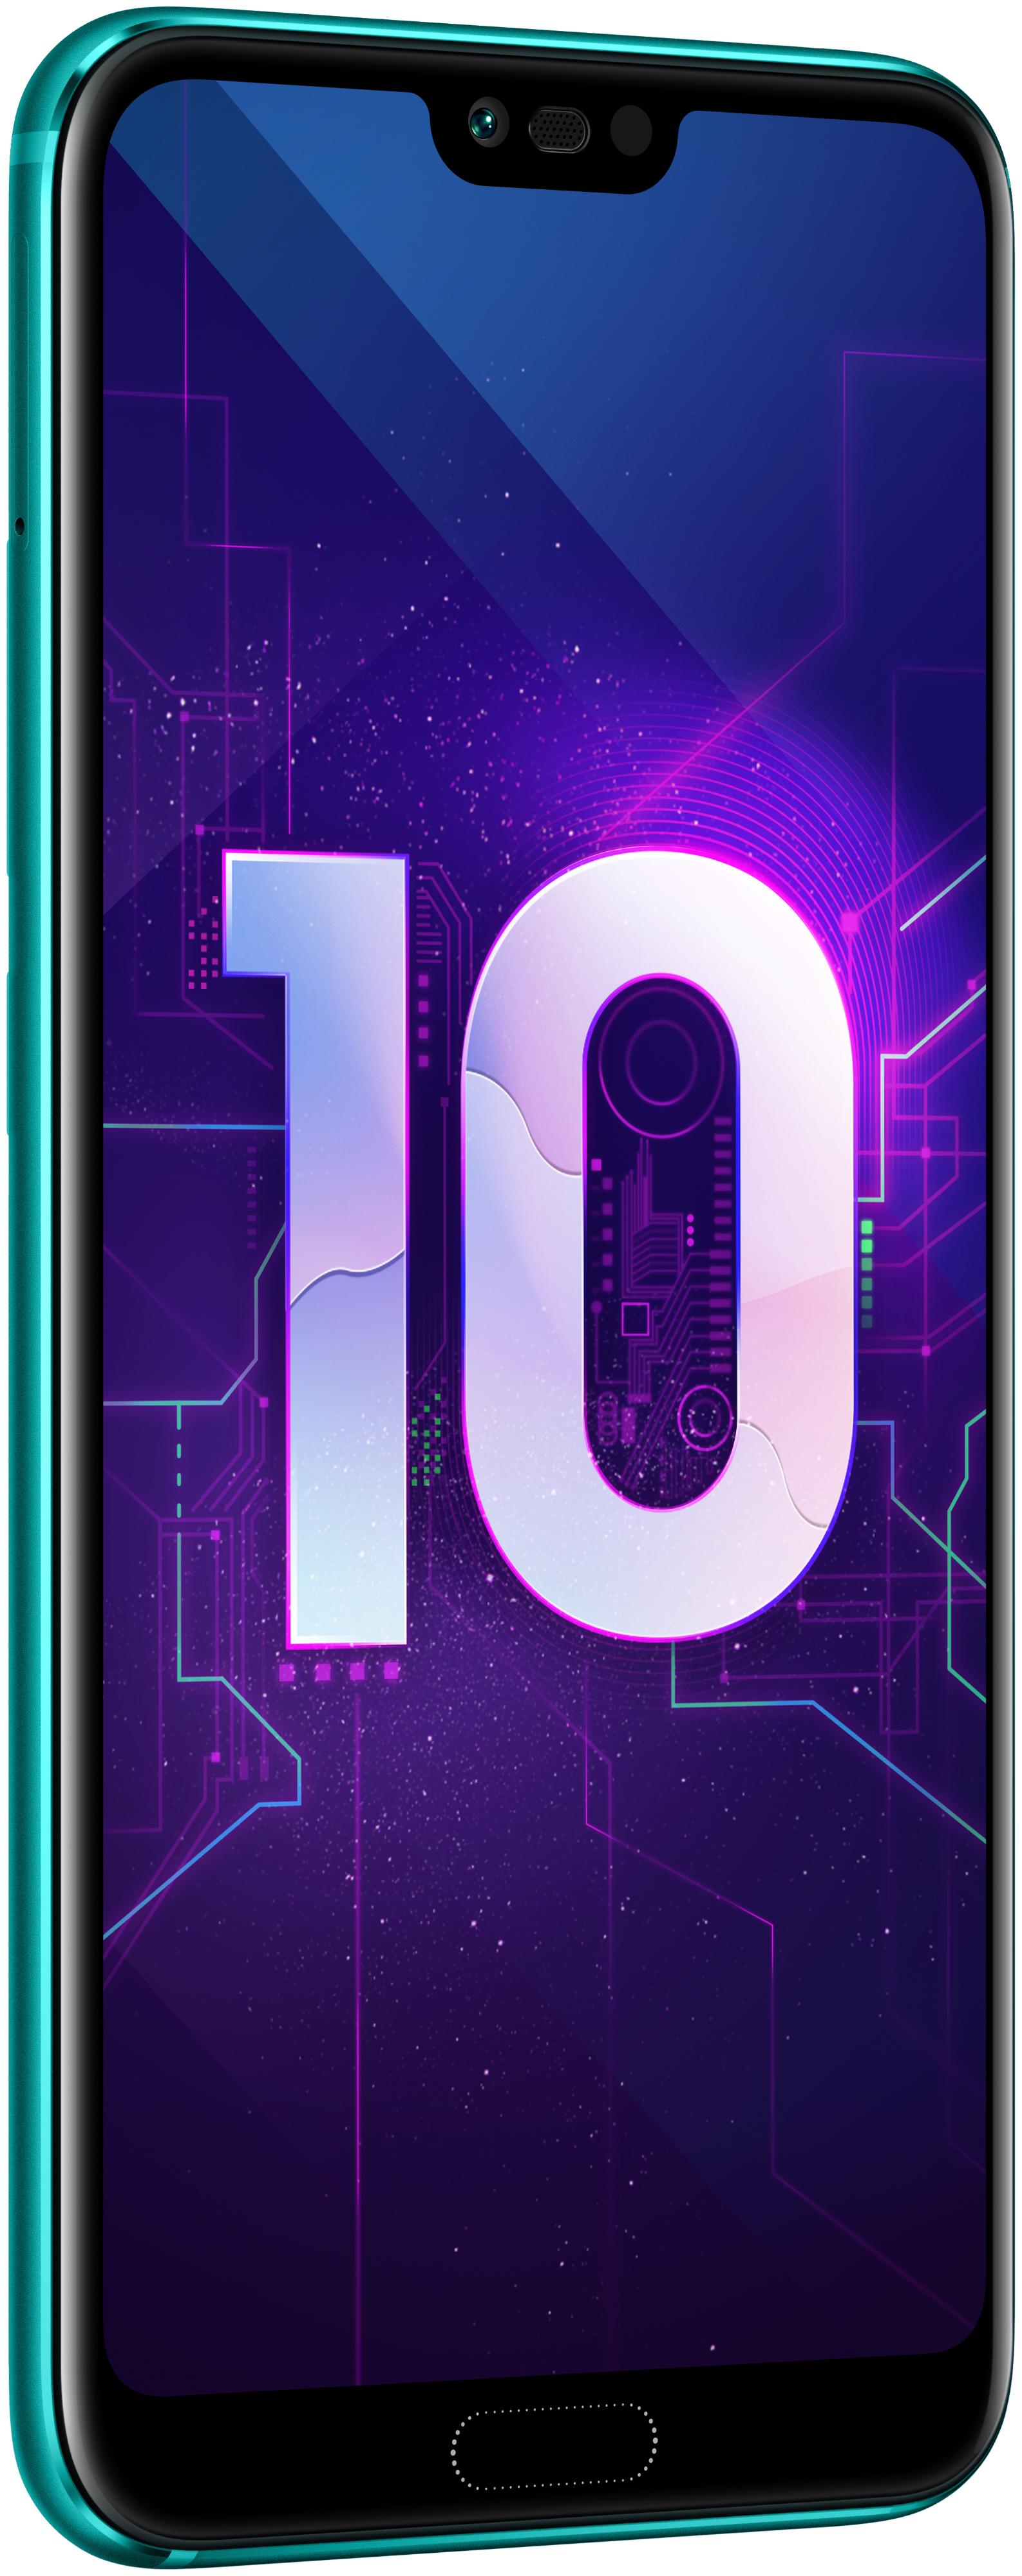 HONOR 10 4/64GB - процессор: HiSilicon Kirin 970